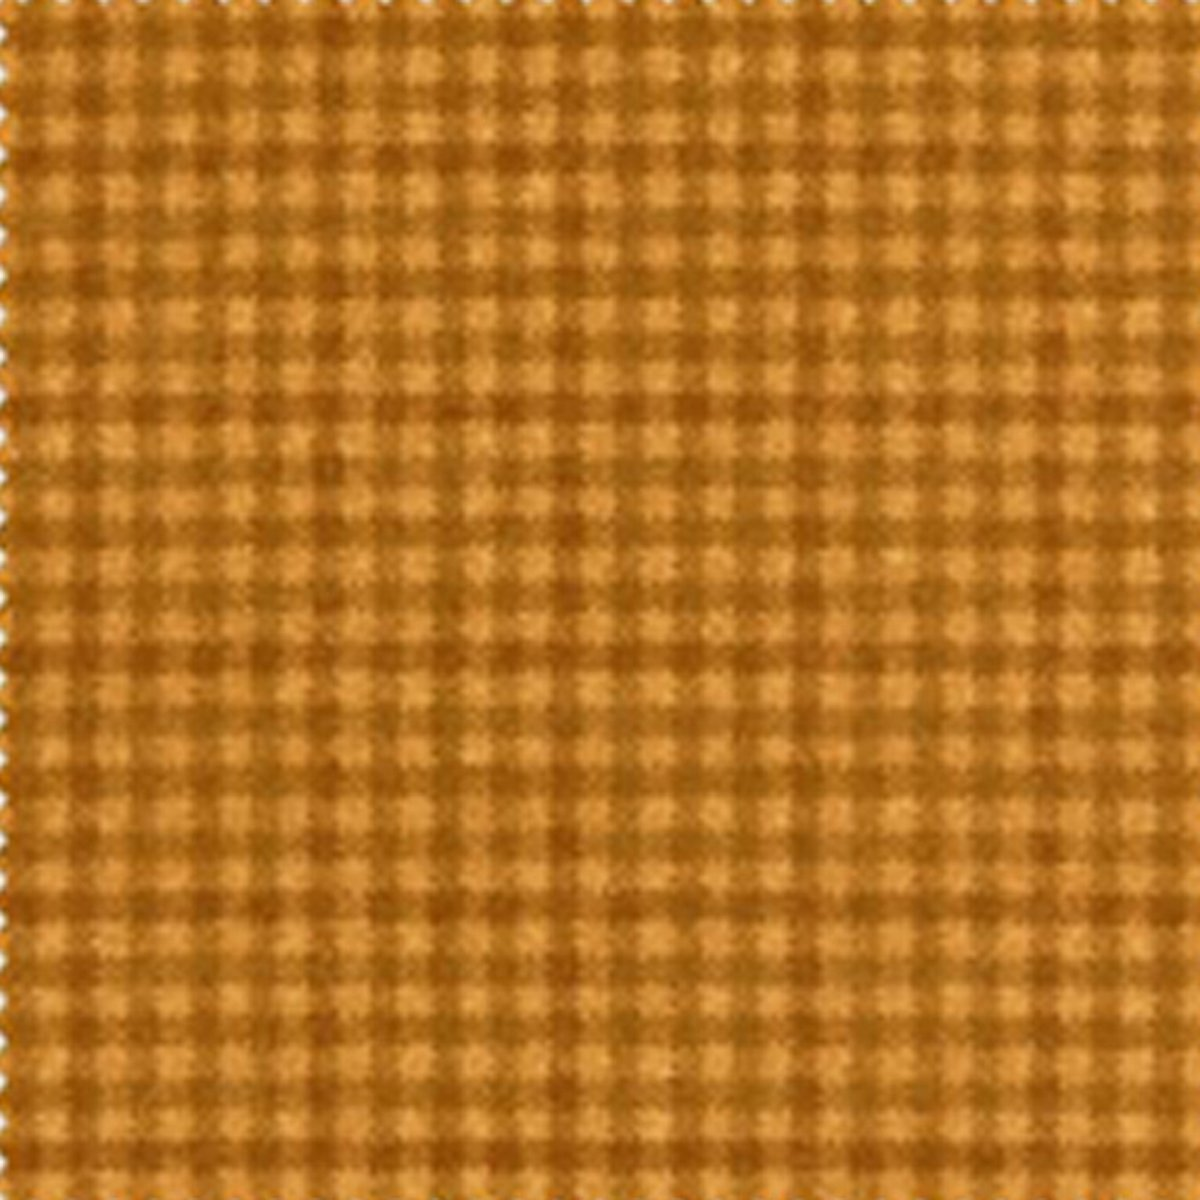 Woolies Flannel - MASF18141-S